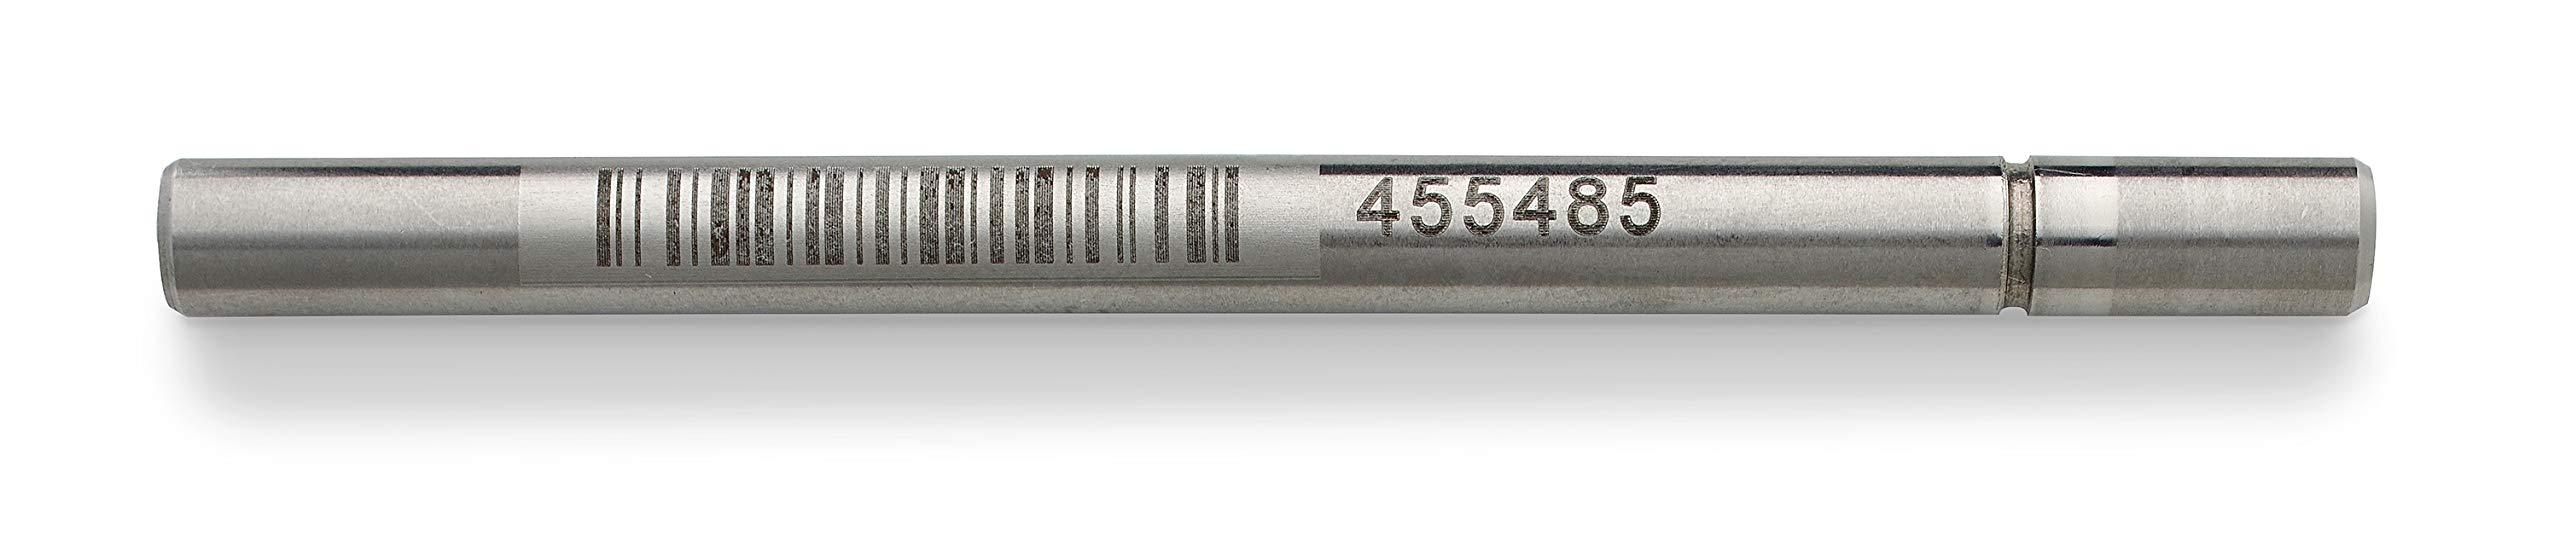 Pack of 10 C2-BXXX-5068 Glass Thermal Desorption Tubes Markes International: Hydrophobic Mix